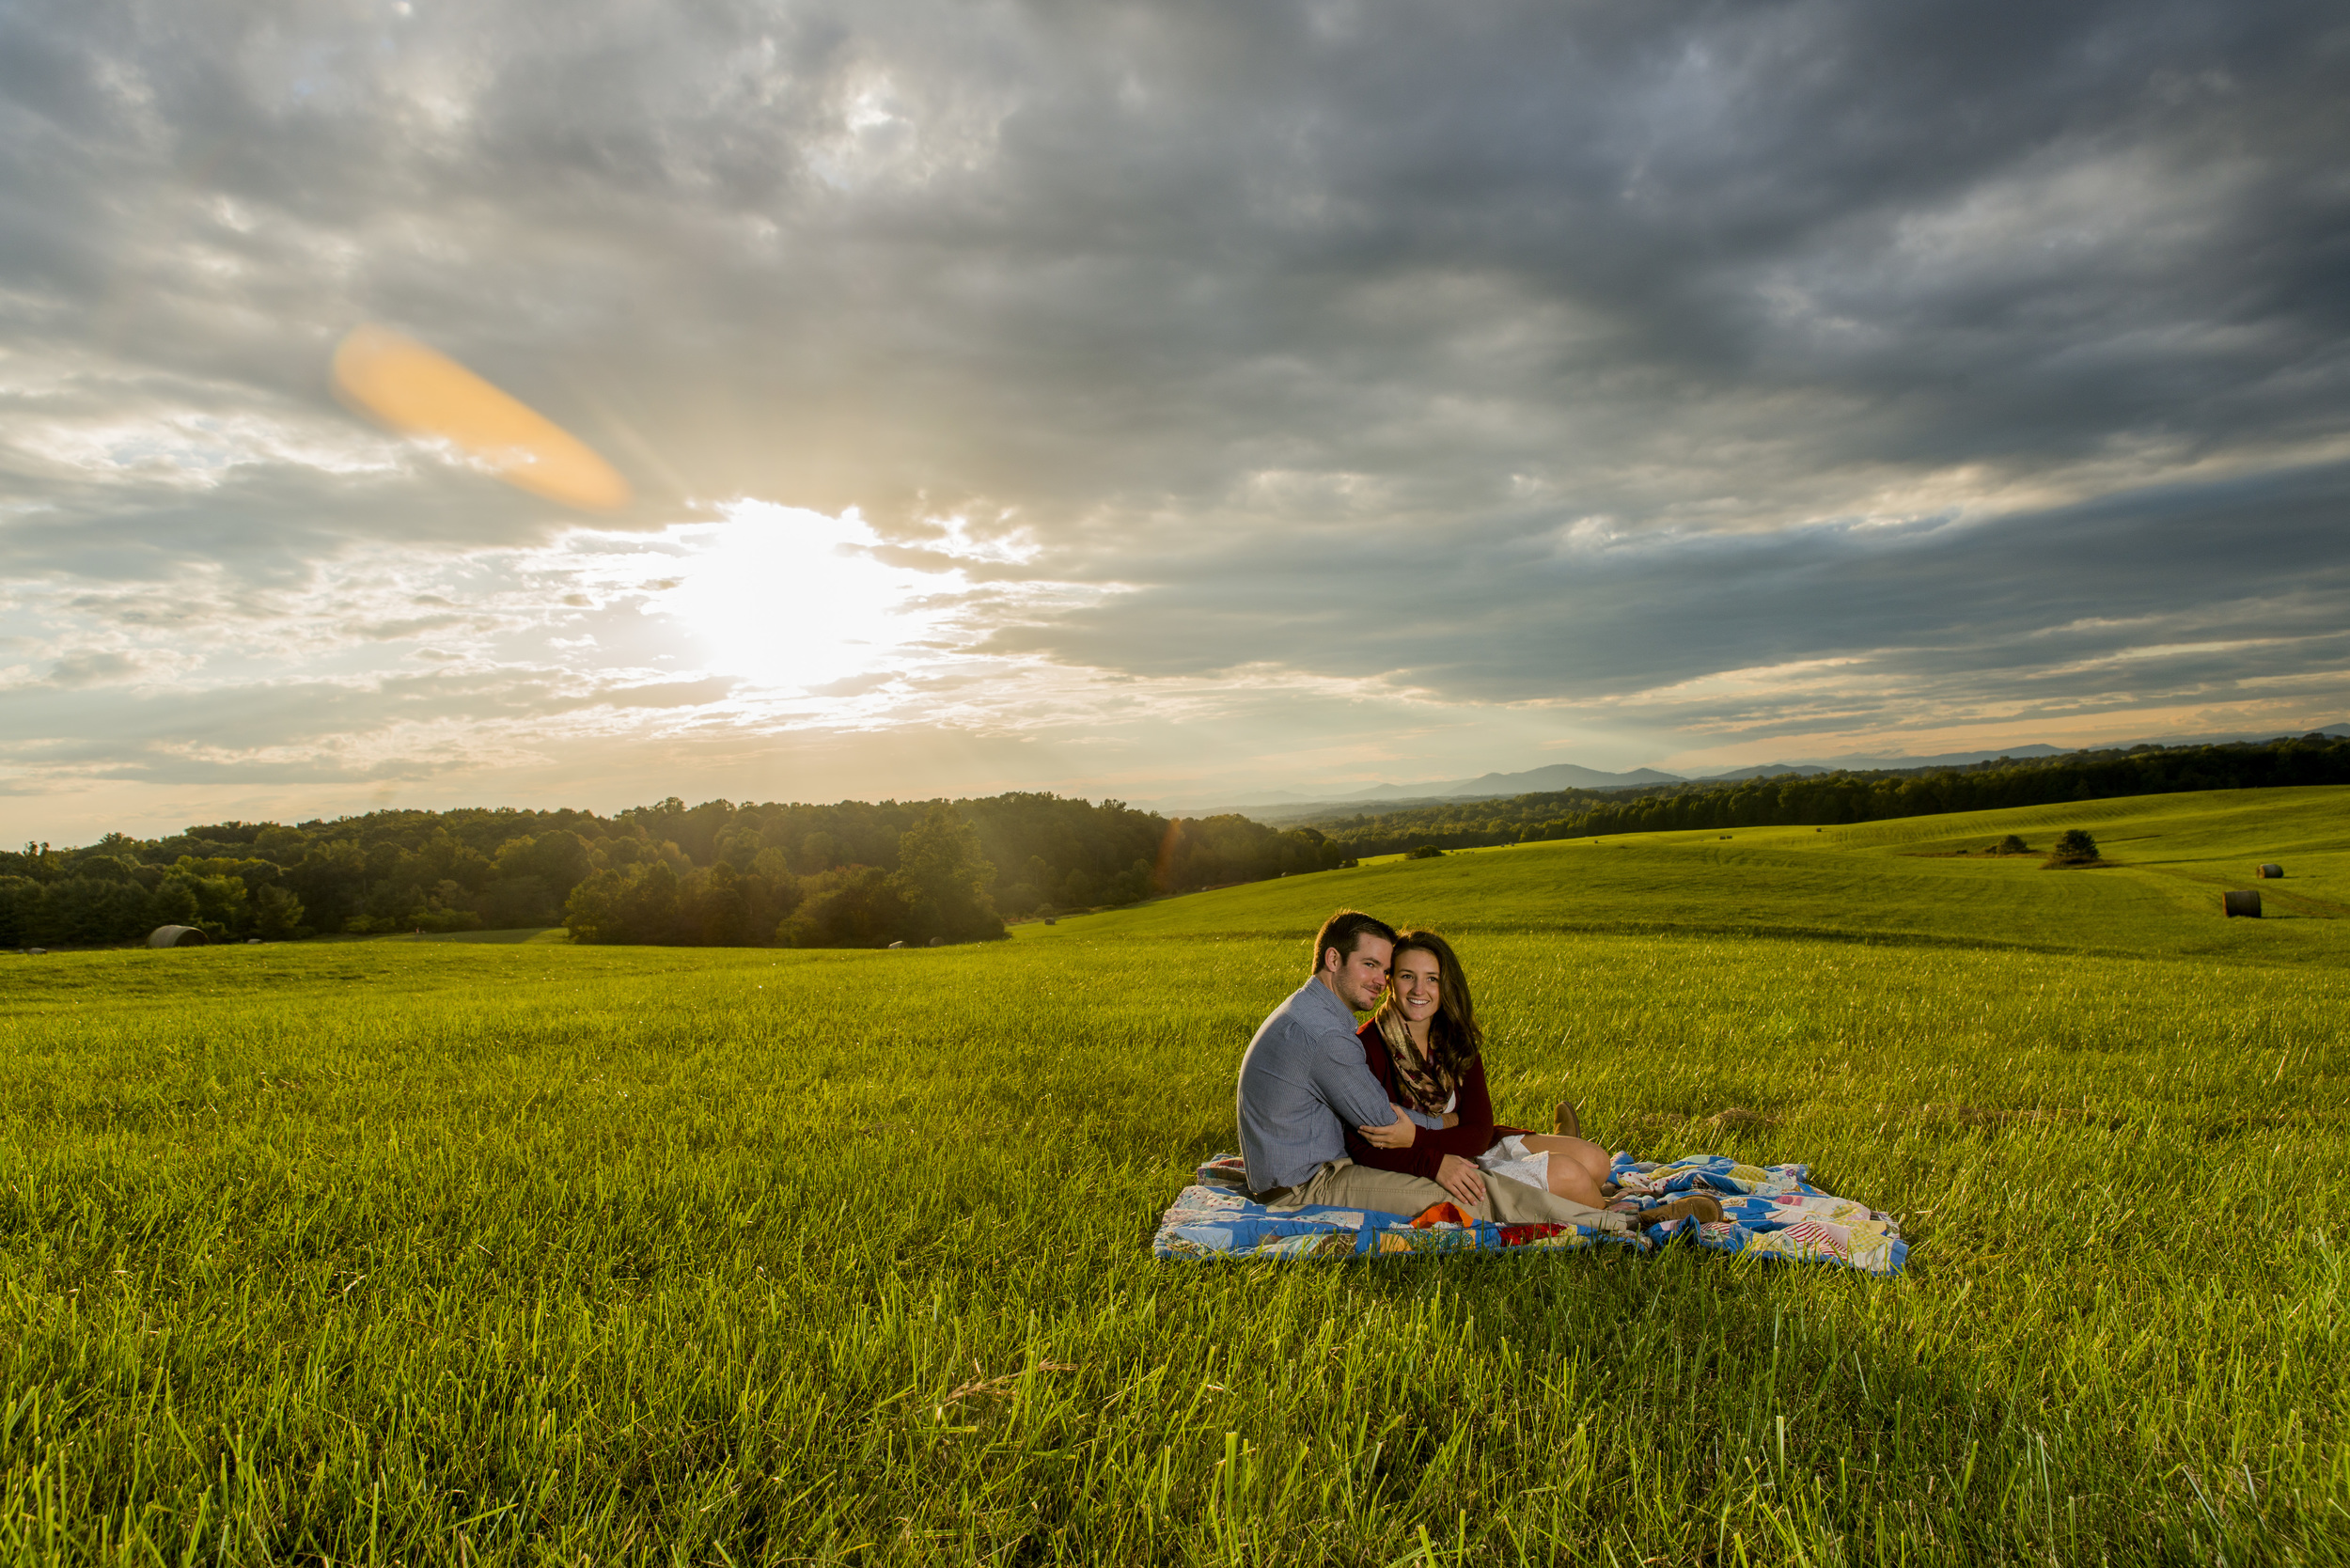 lake_romantic_field_sunset_engagement_session_lynchburg_va021.jpg